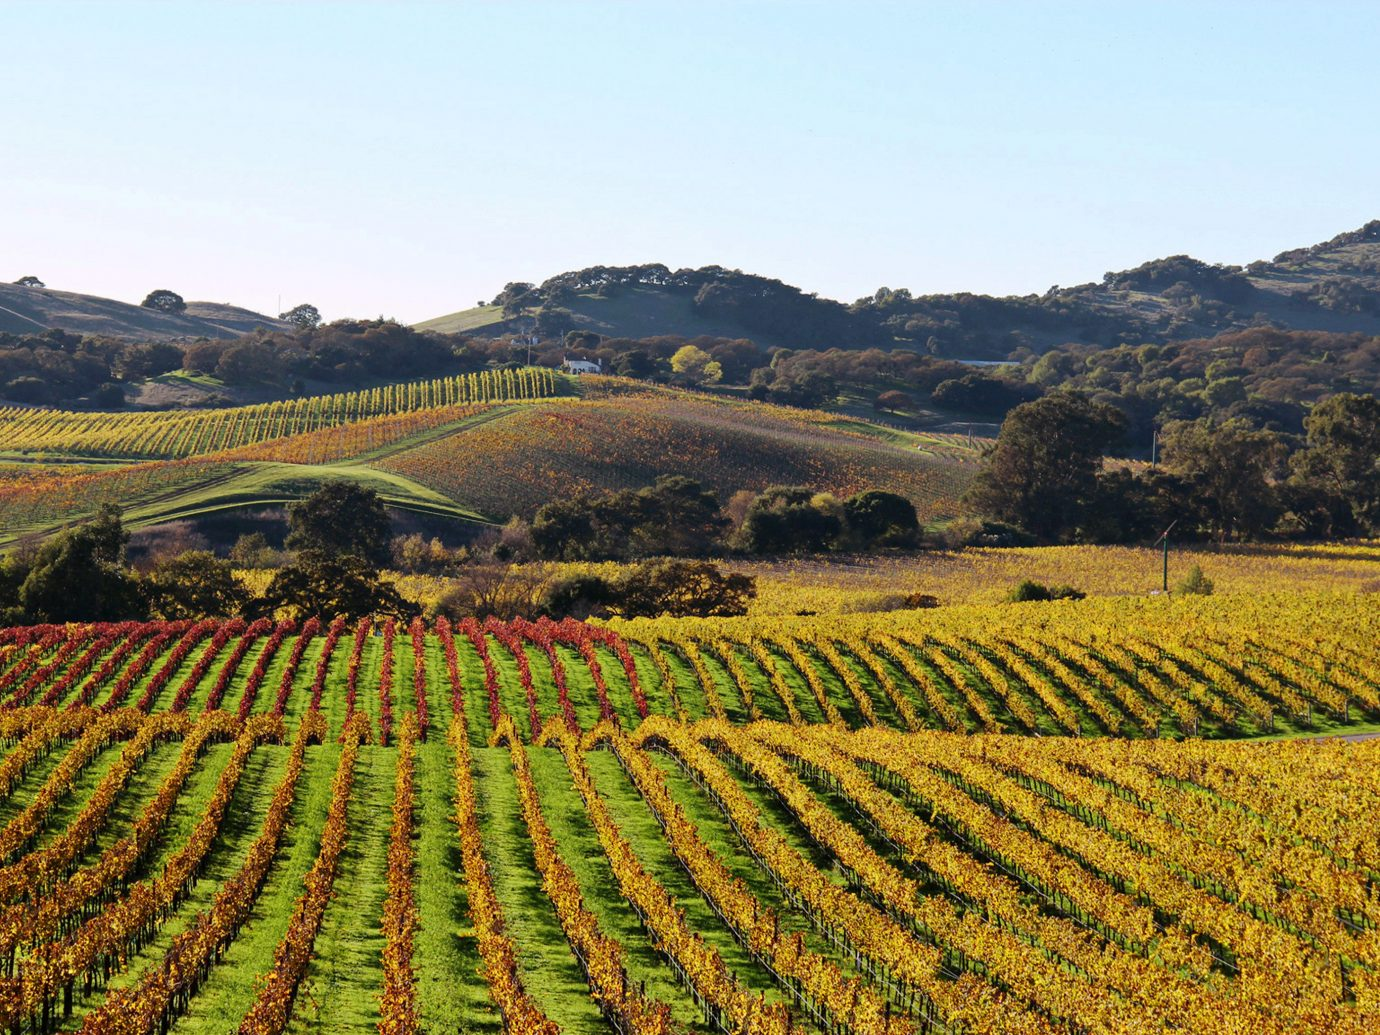 MacArthur Place winery field